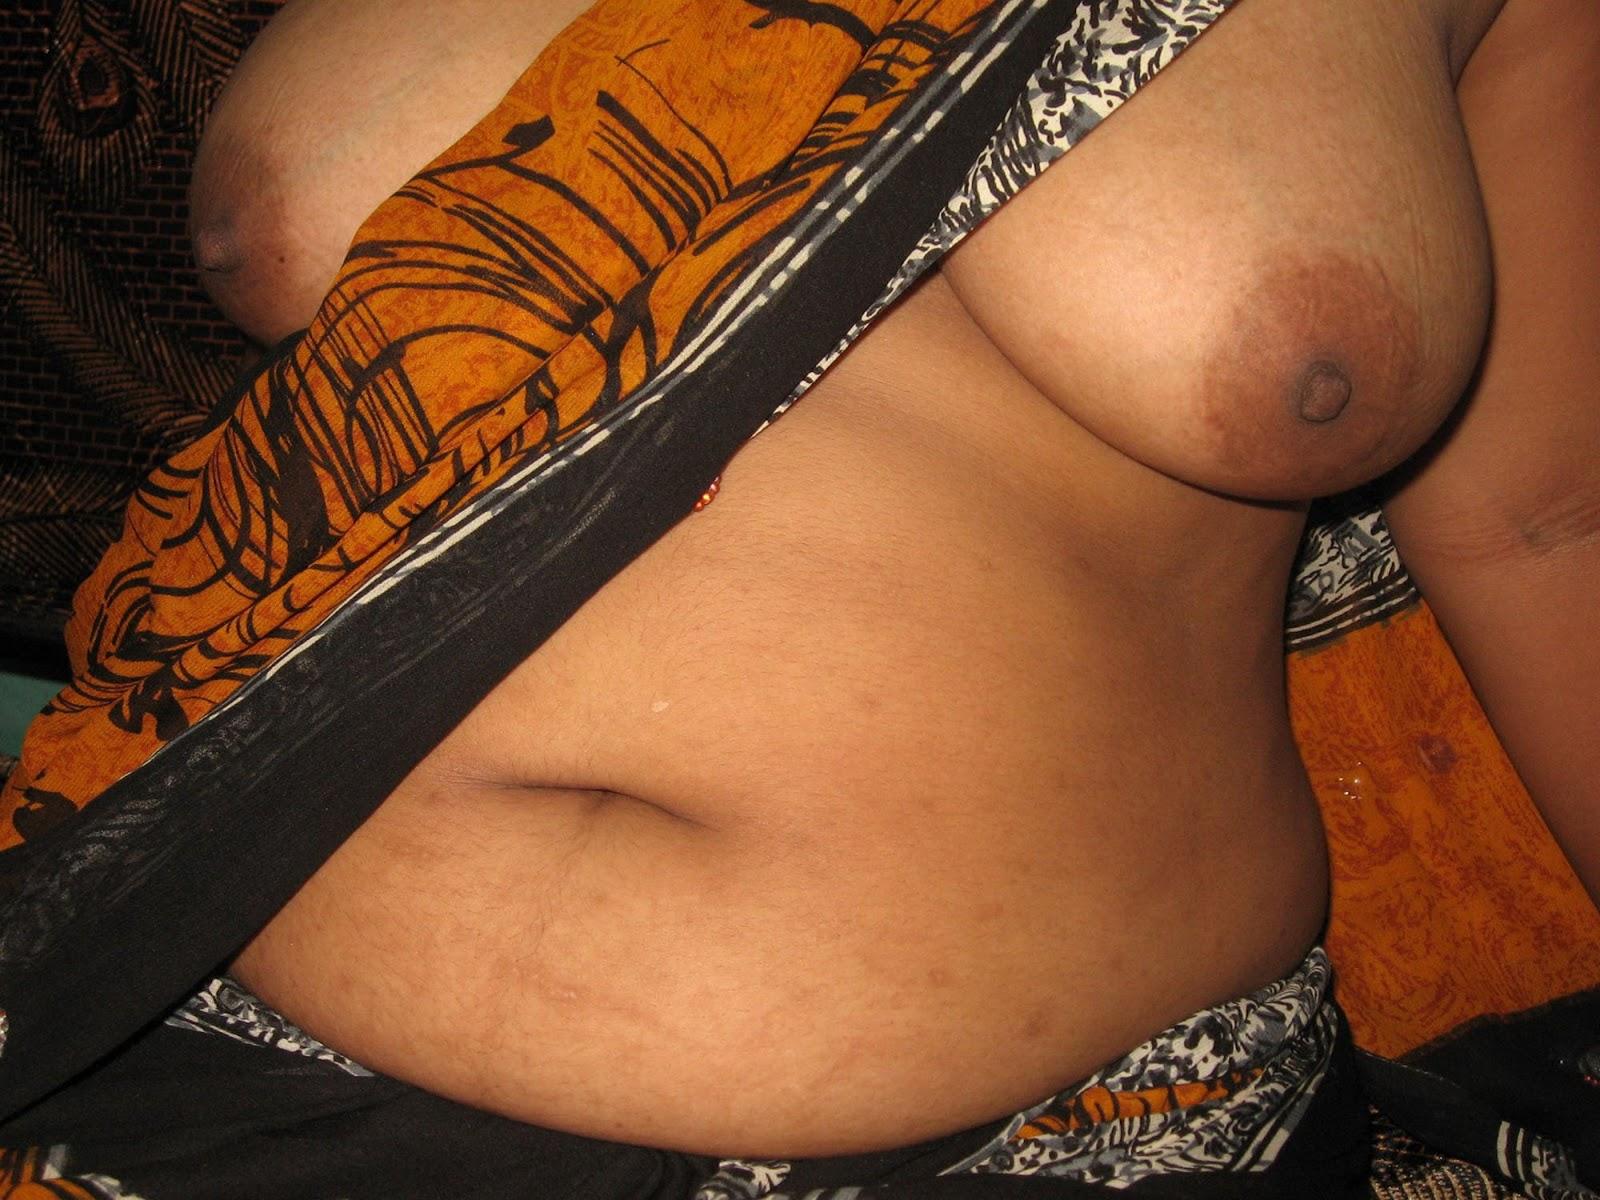 Girl big ass sex video in home